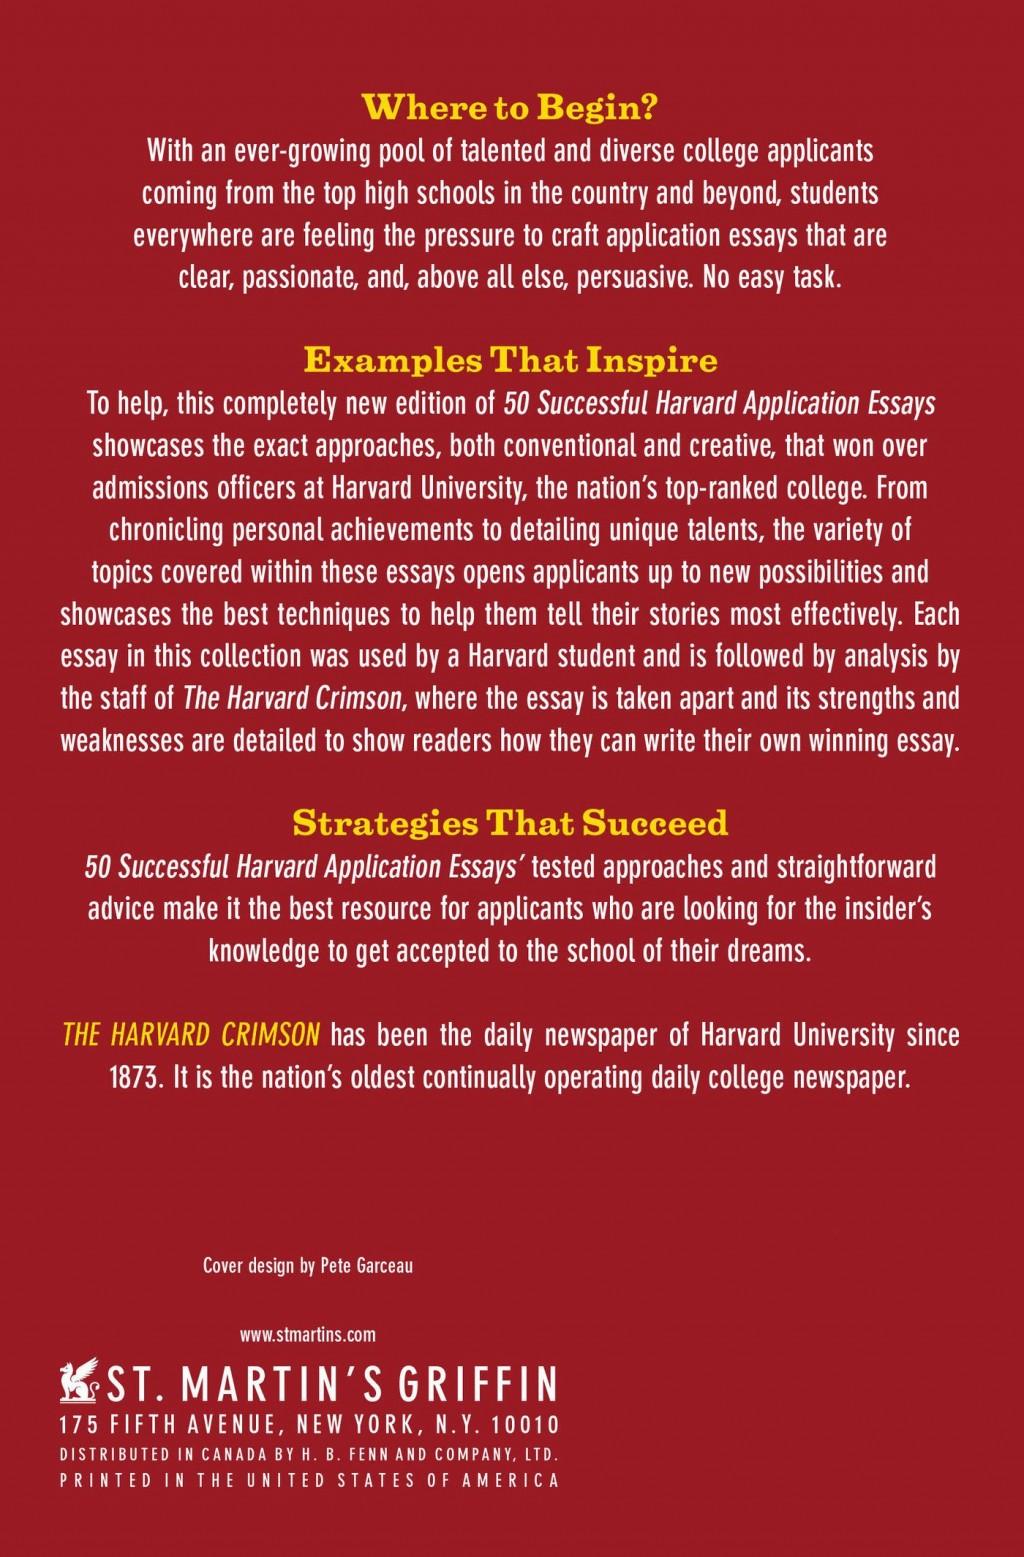 013 815kp6cfuhl Harvard Accepted Essays Essay Fantastic Business School Reddit College Book Large